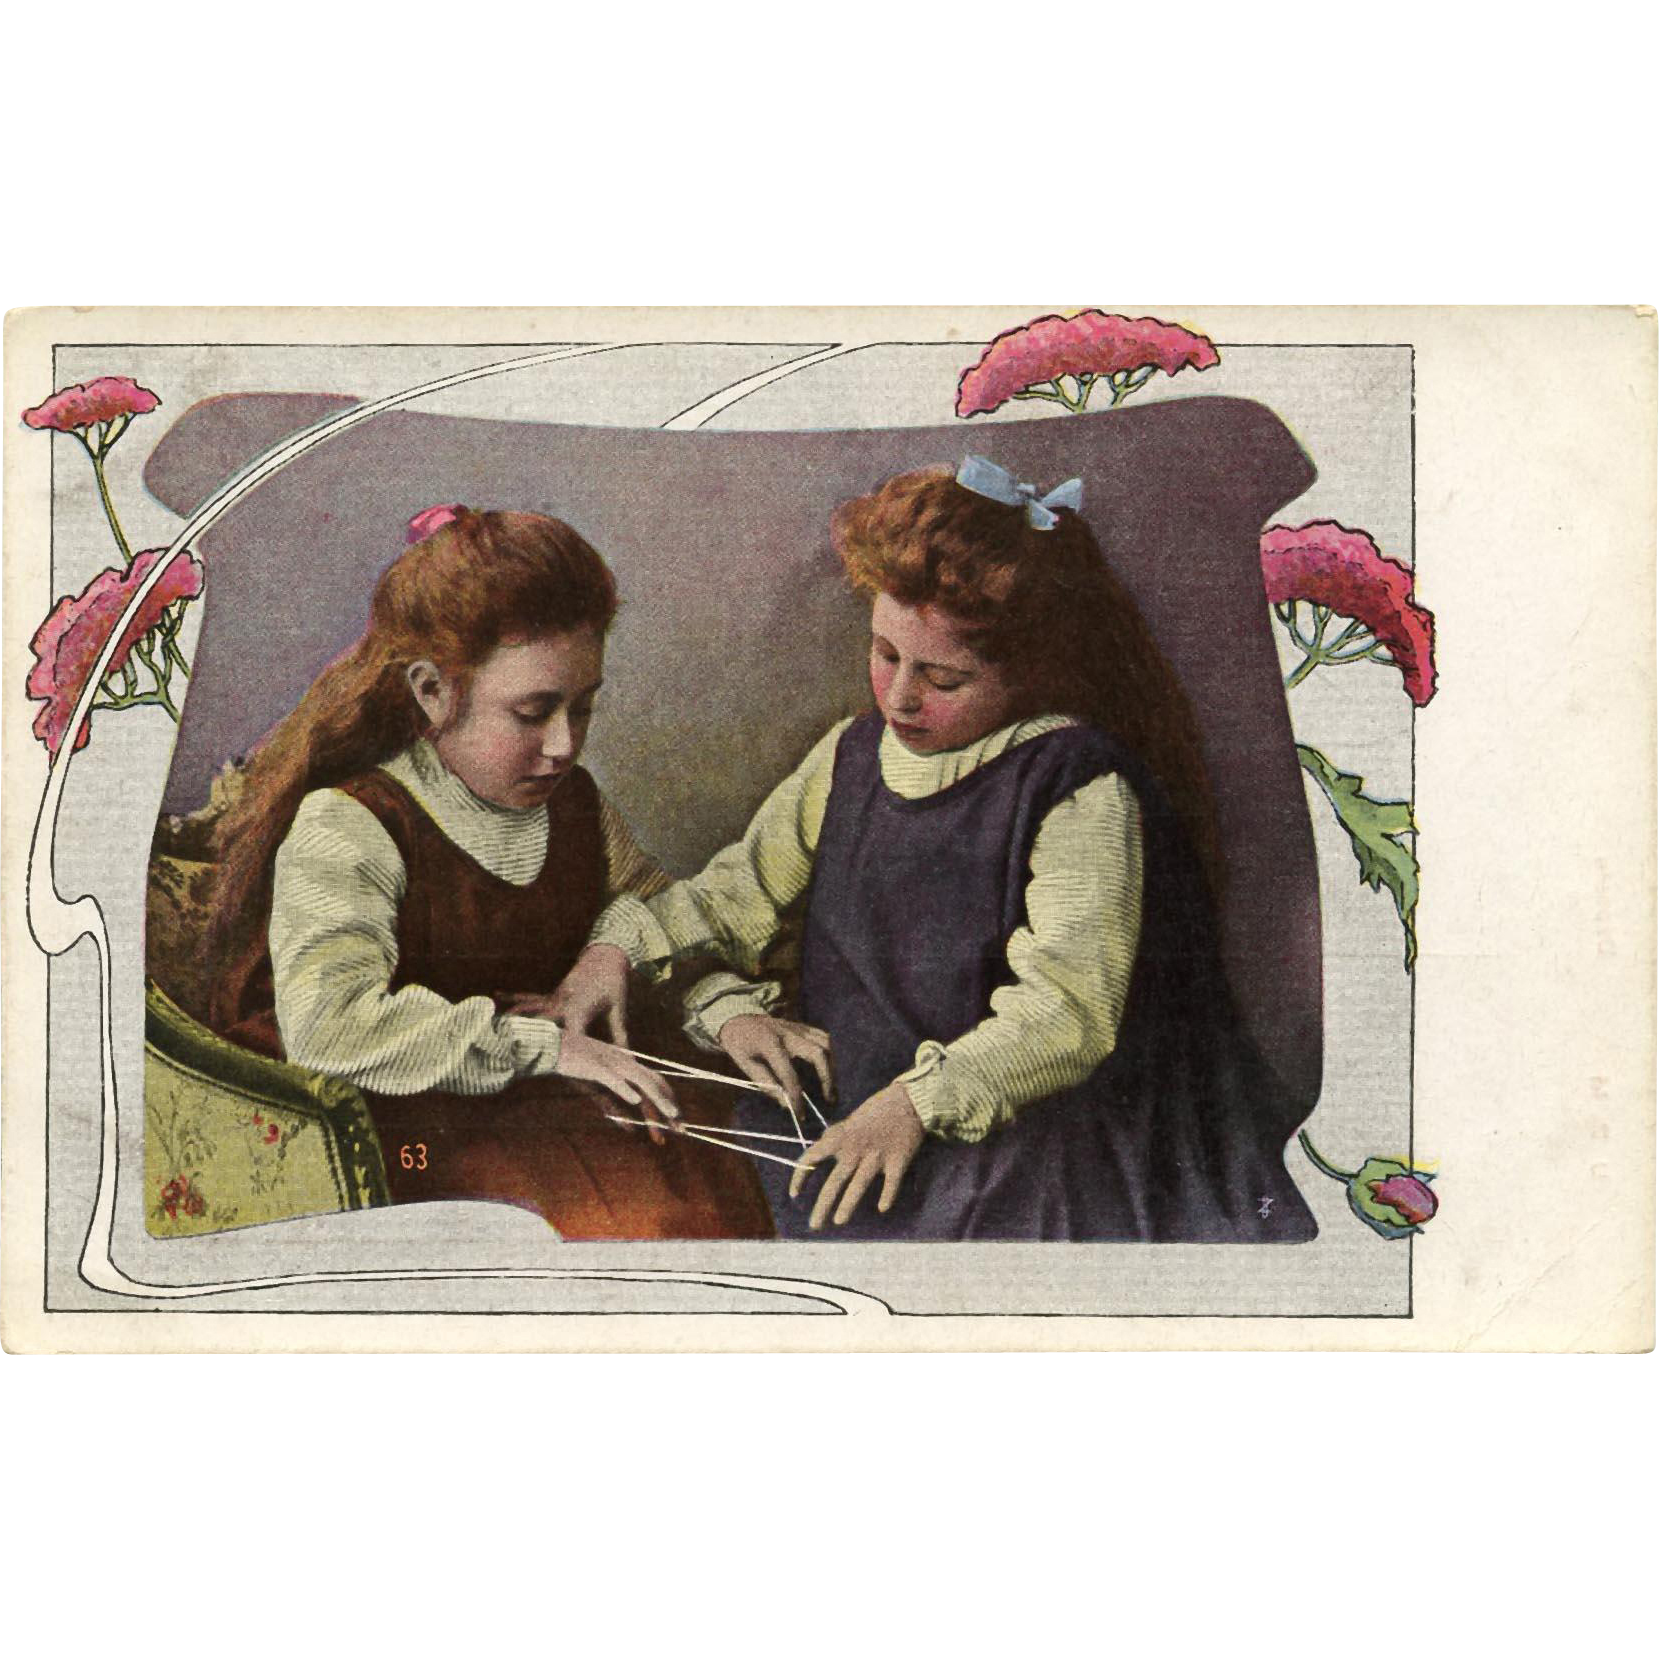 Two Edwardian Girls Playing Cat's Cradle String Game Antique European Postcard